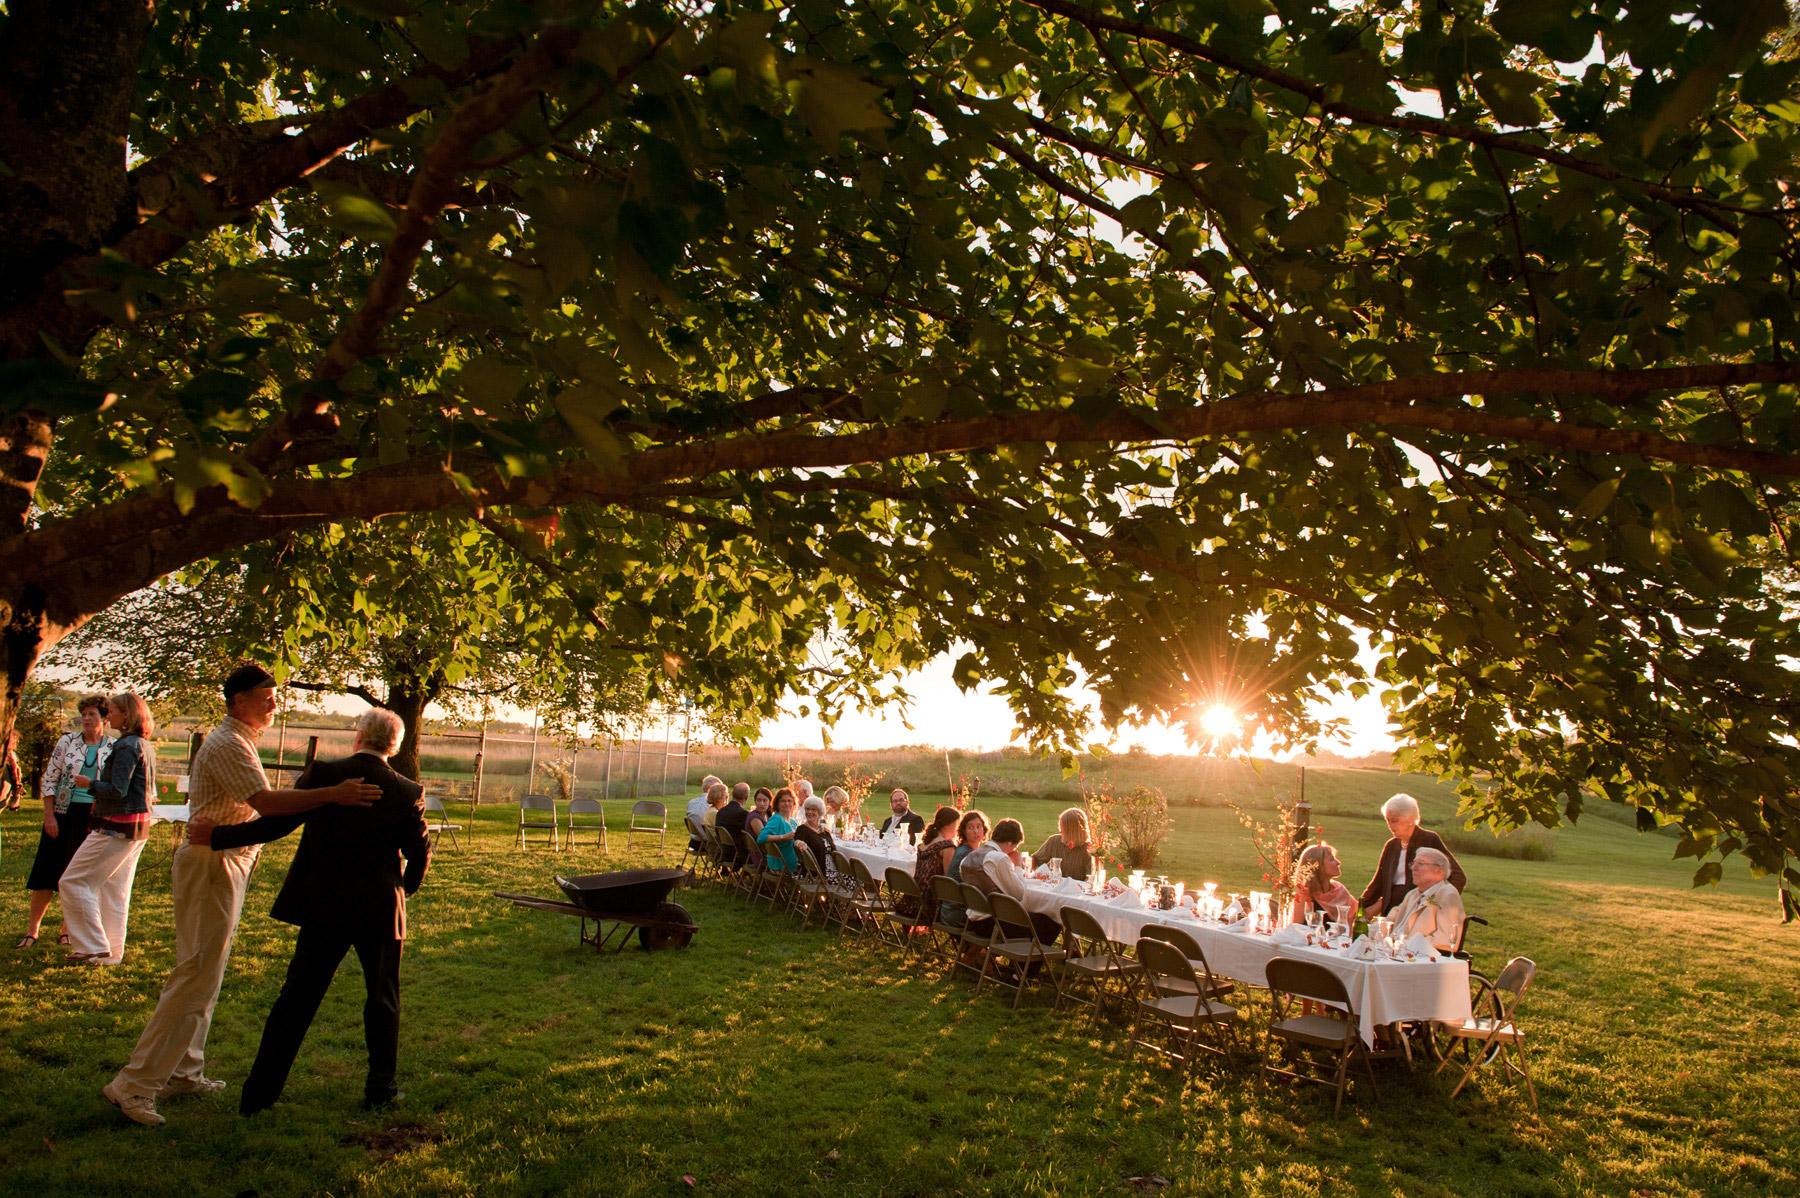 wedding-photography-saint-paul-mark-kegans-635.jpg